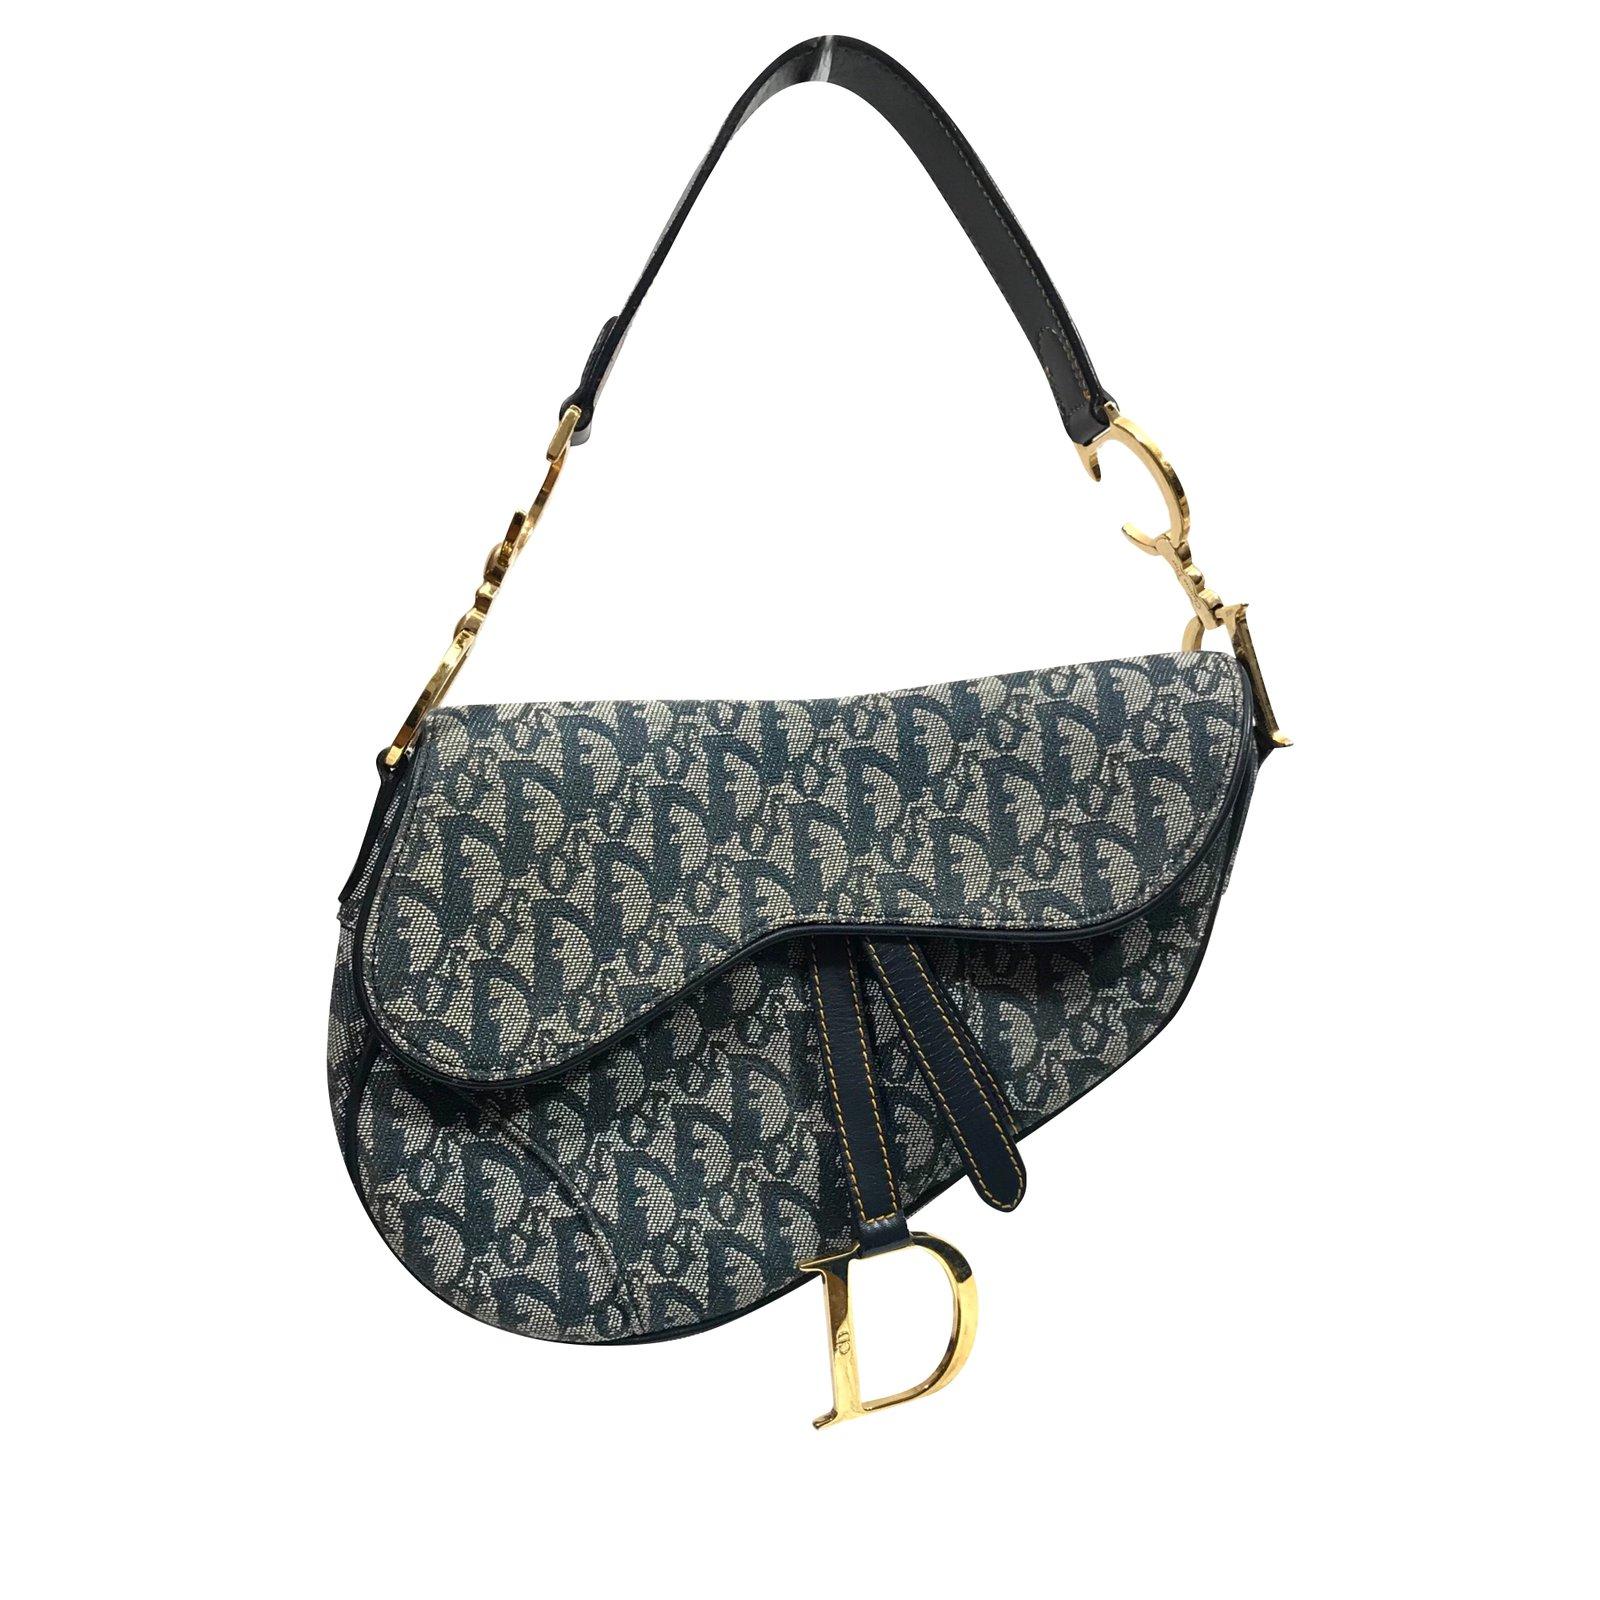 7086b392bfc Christian Dior Saddle Bag iconique Handbags Leather,Cloth Navy blue  ref.89642